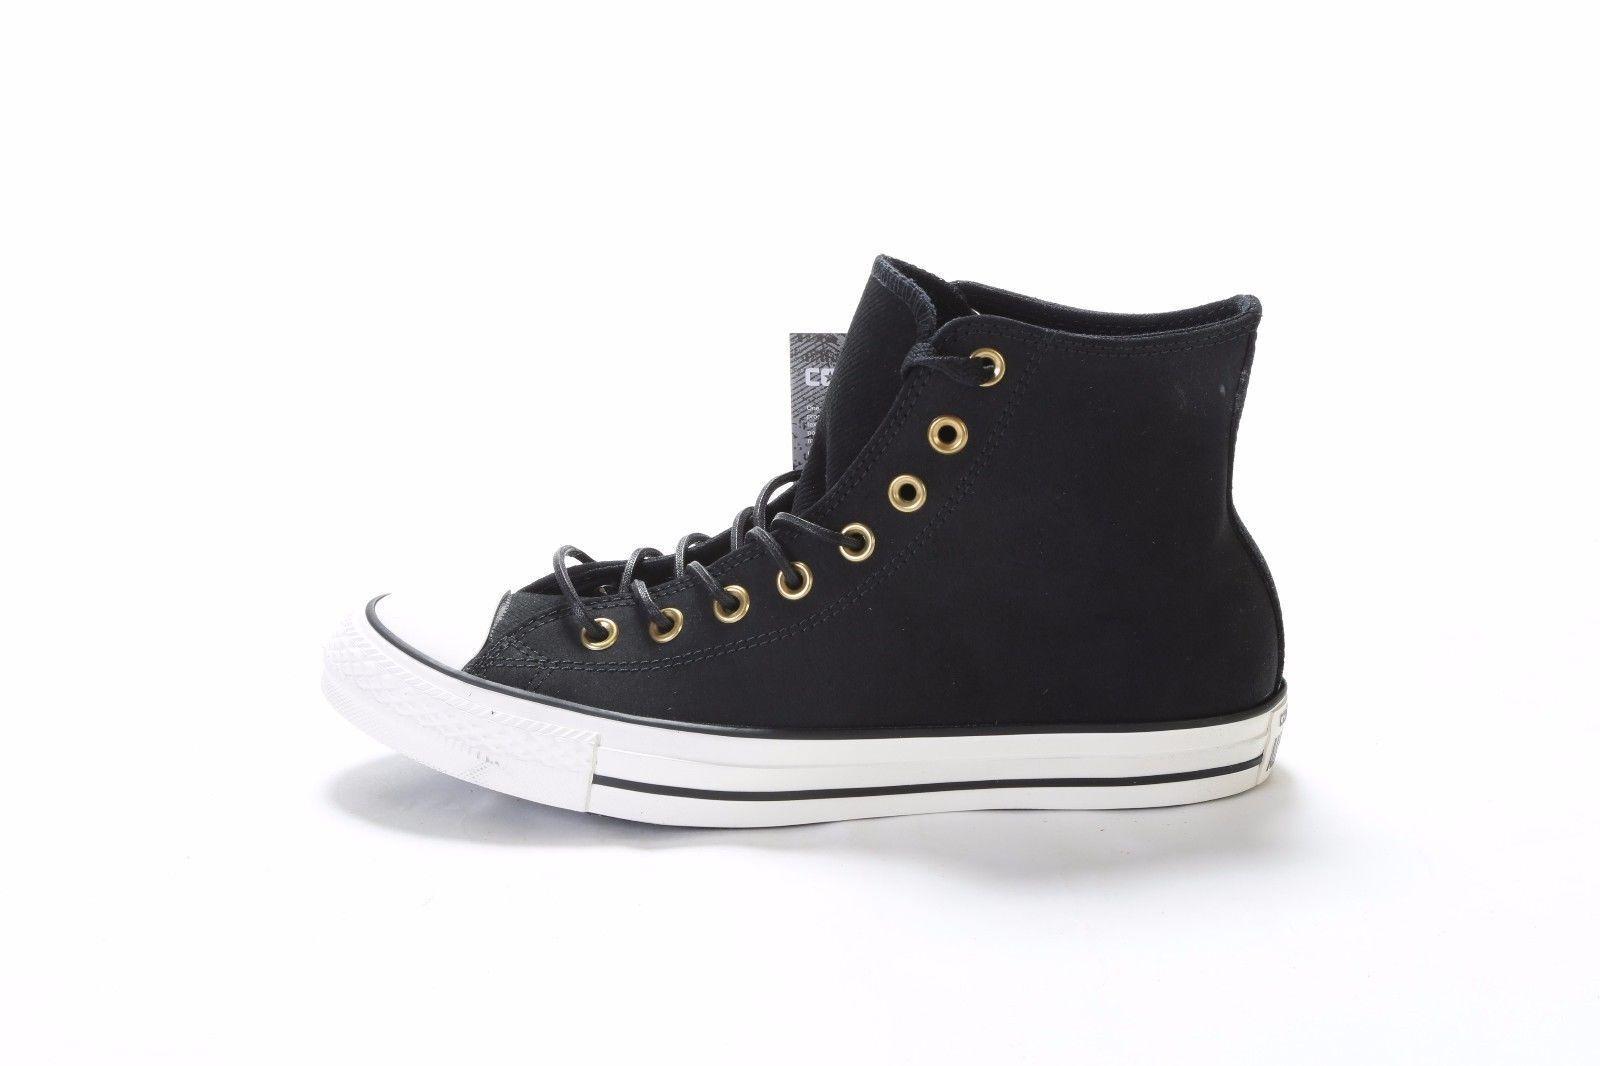 Converse Chuck Taylor All Star HI noir -blanc- noir Classic 153808C